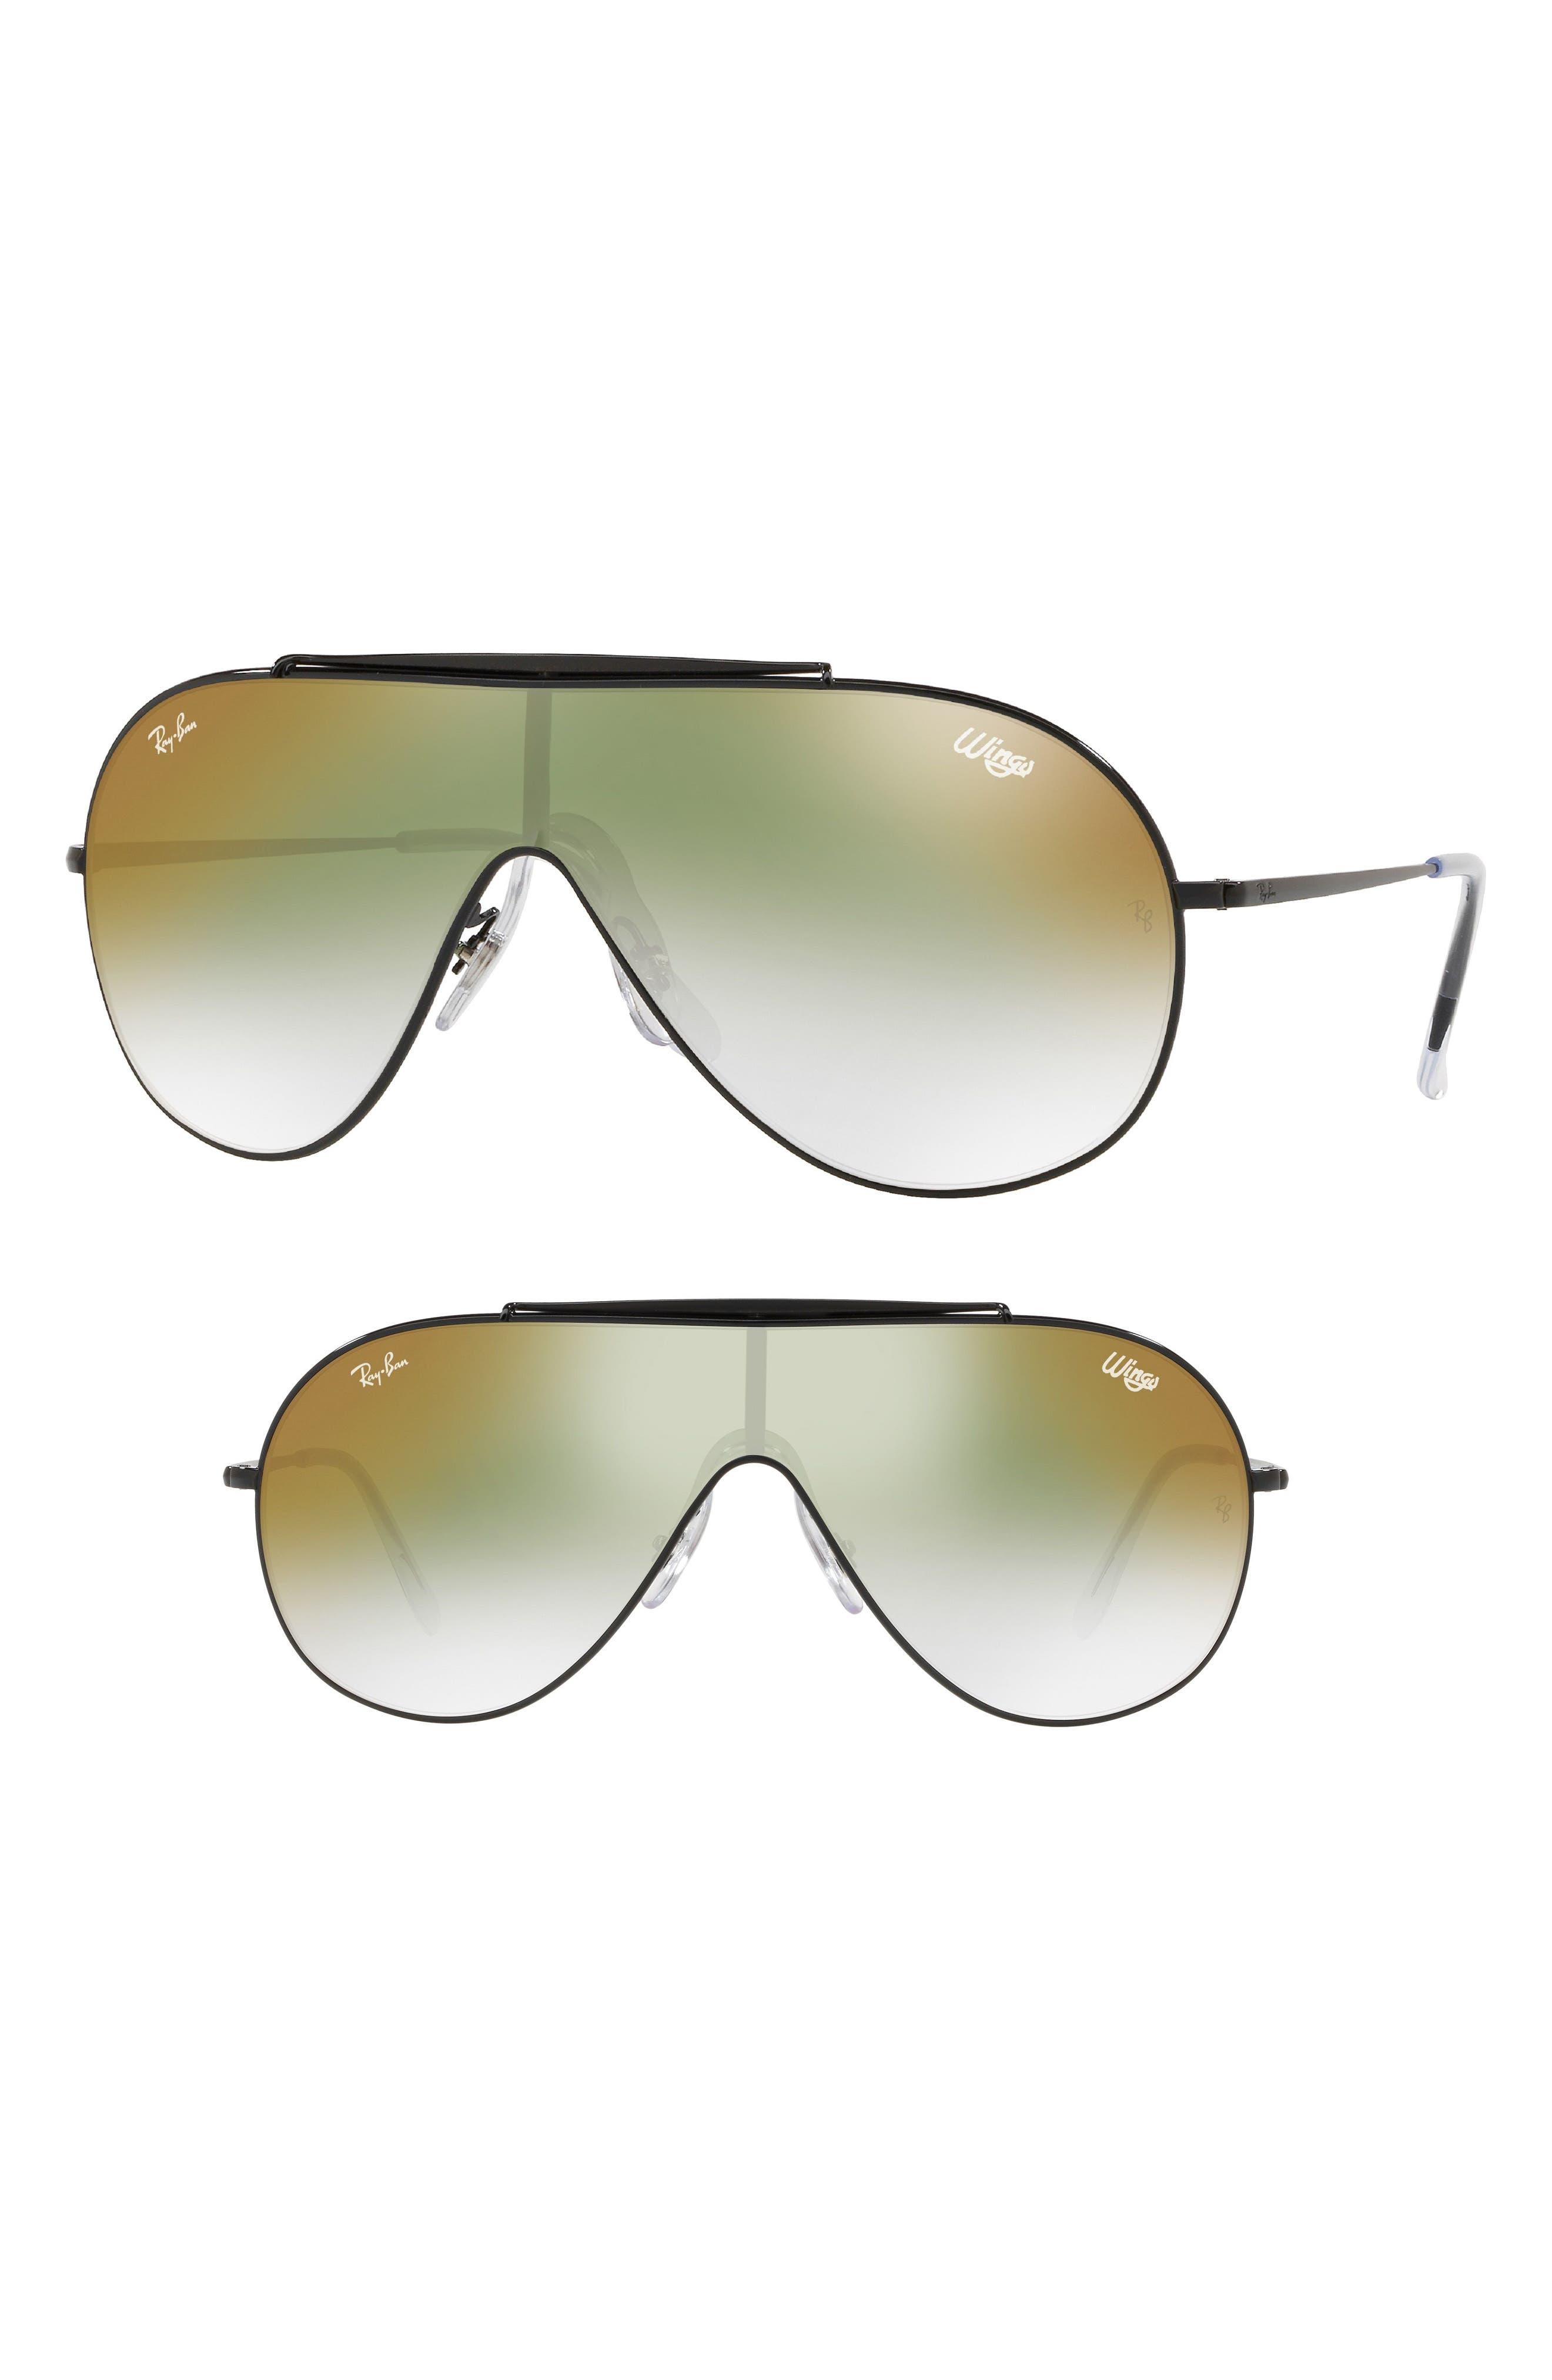 133mm Shield Sunglasses,                             Main thumbnail 1, color,                             001